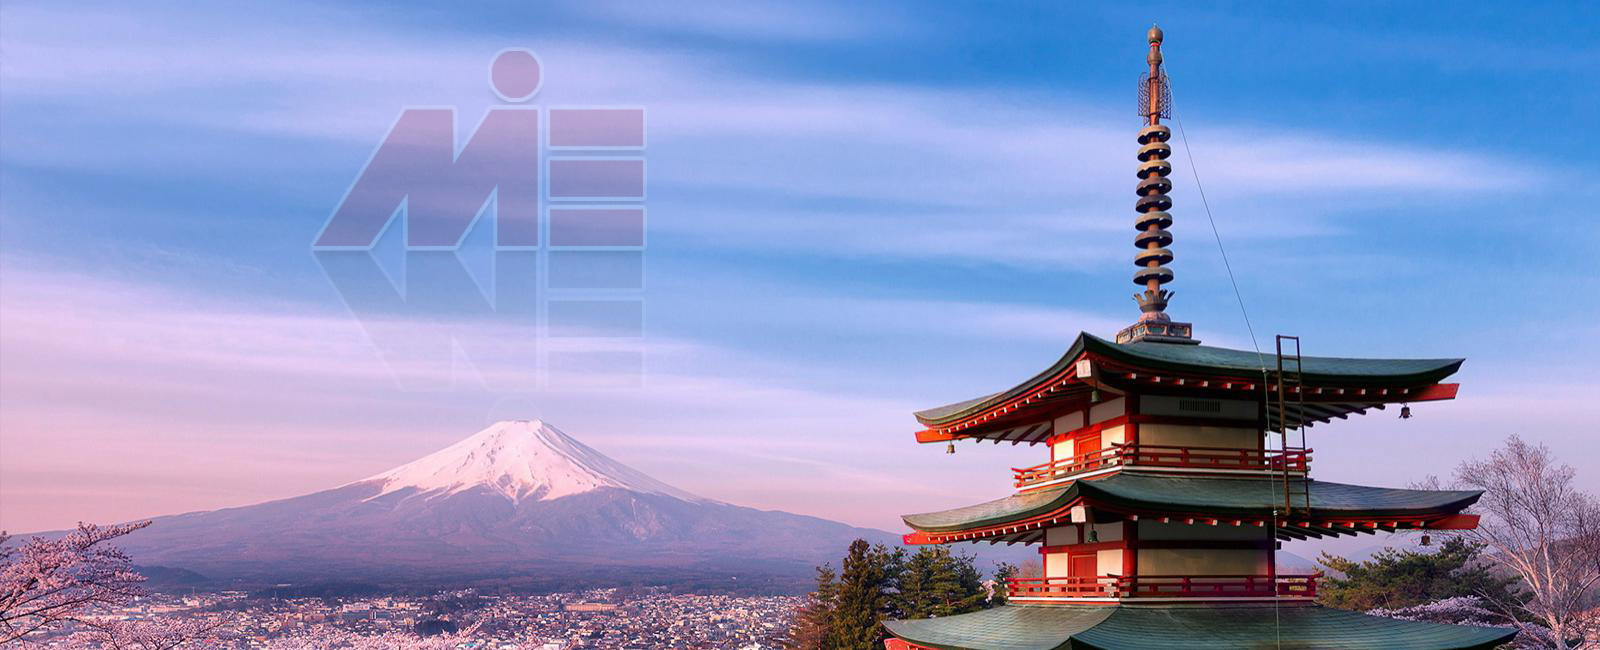 mount fuji تحصیل پزشکی در ژاپن